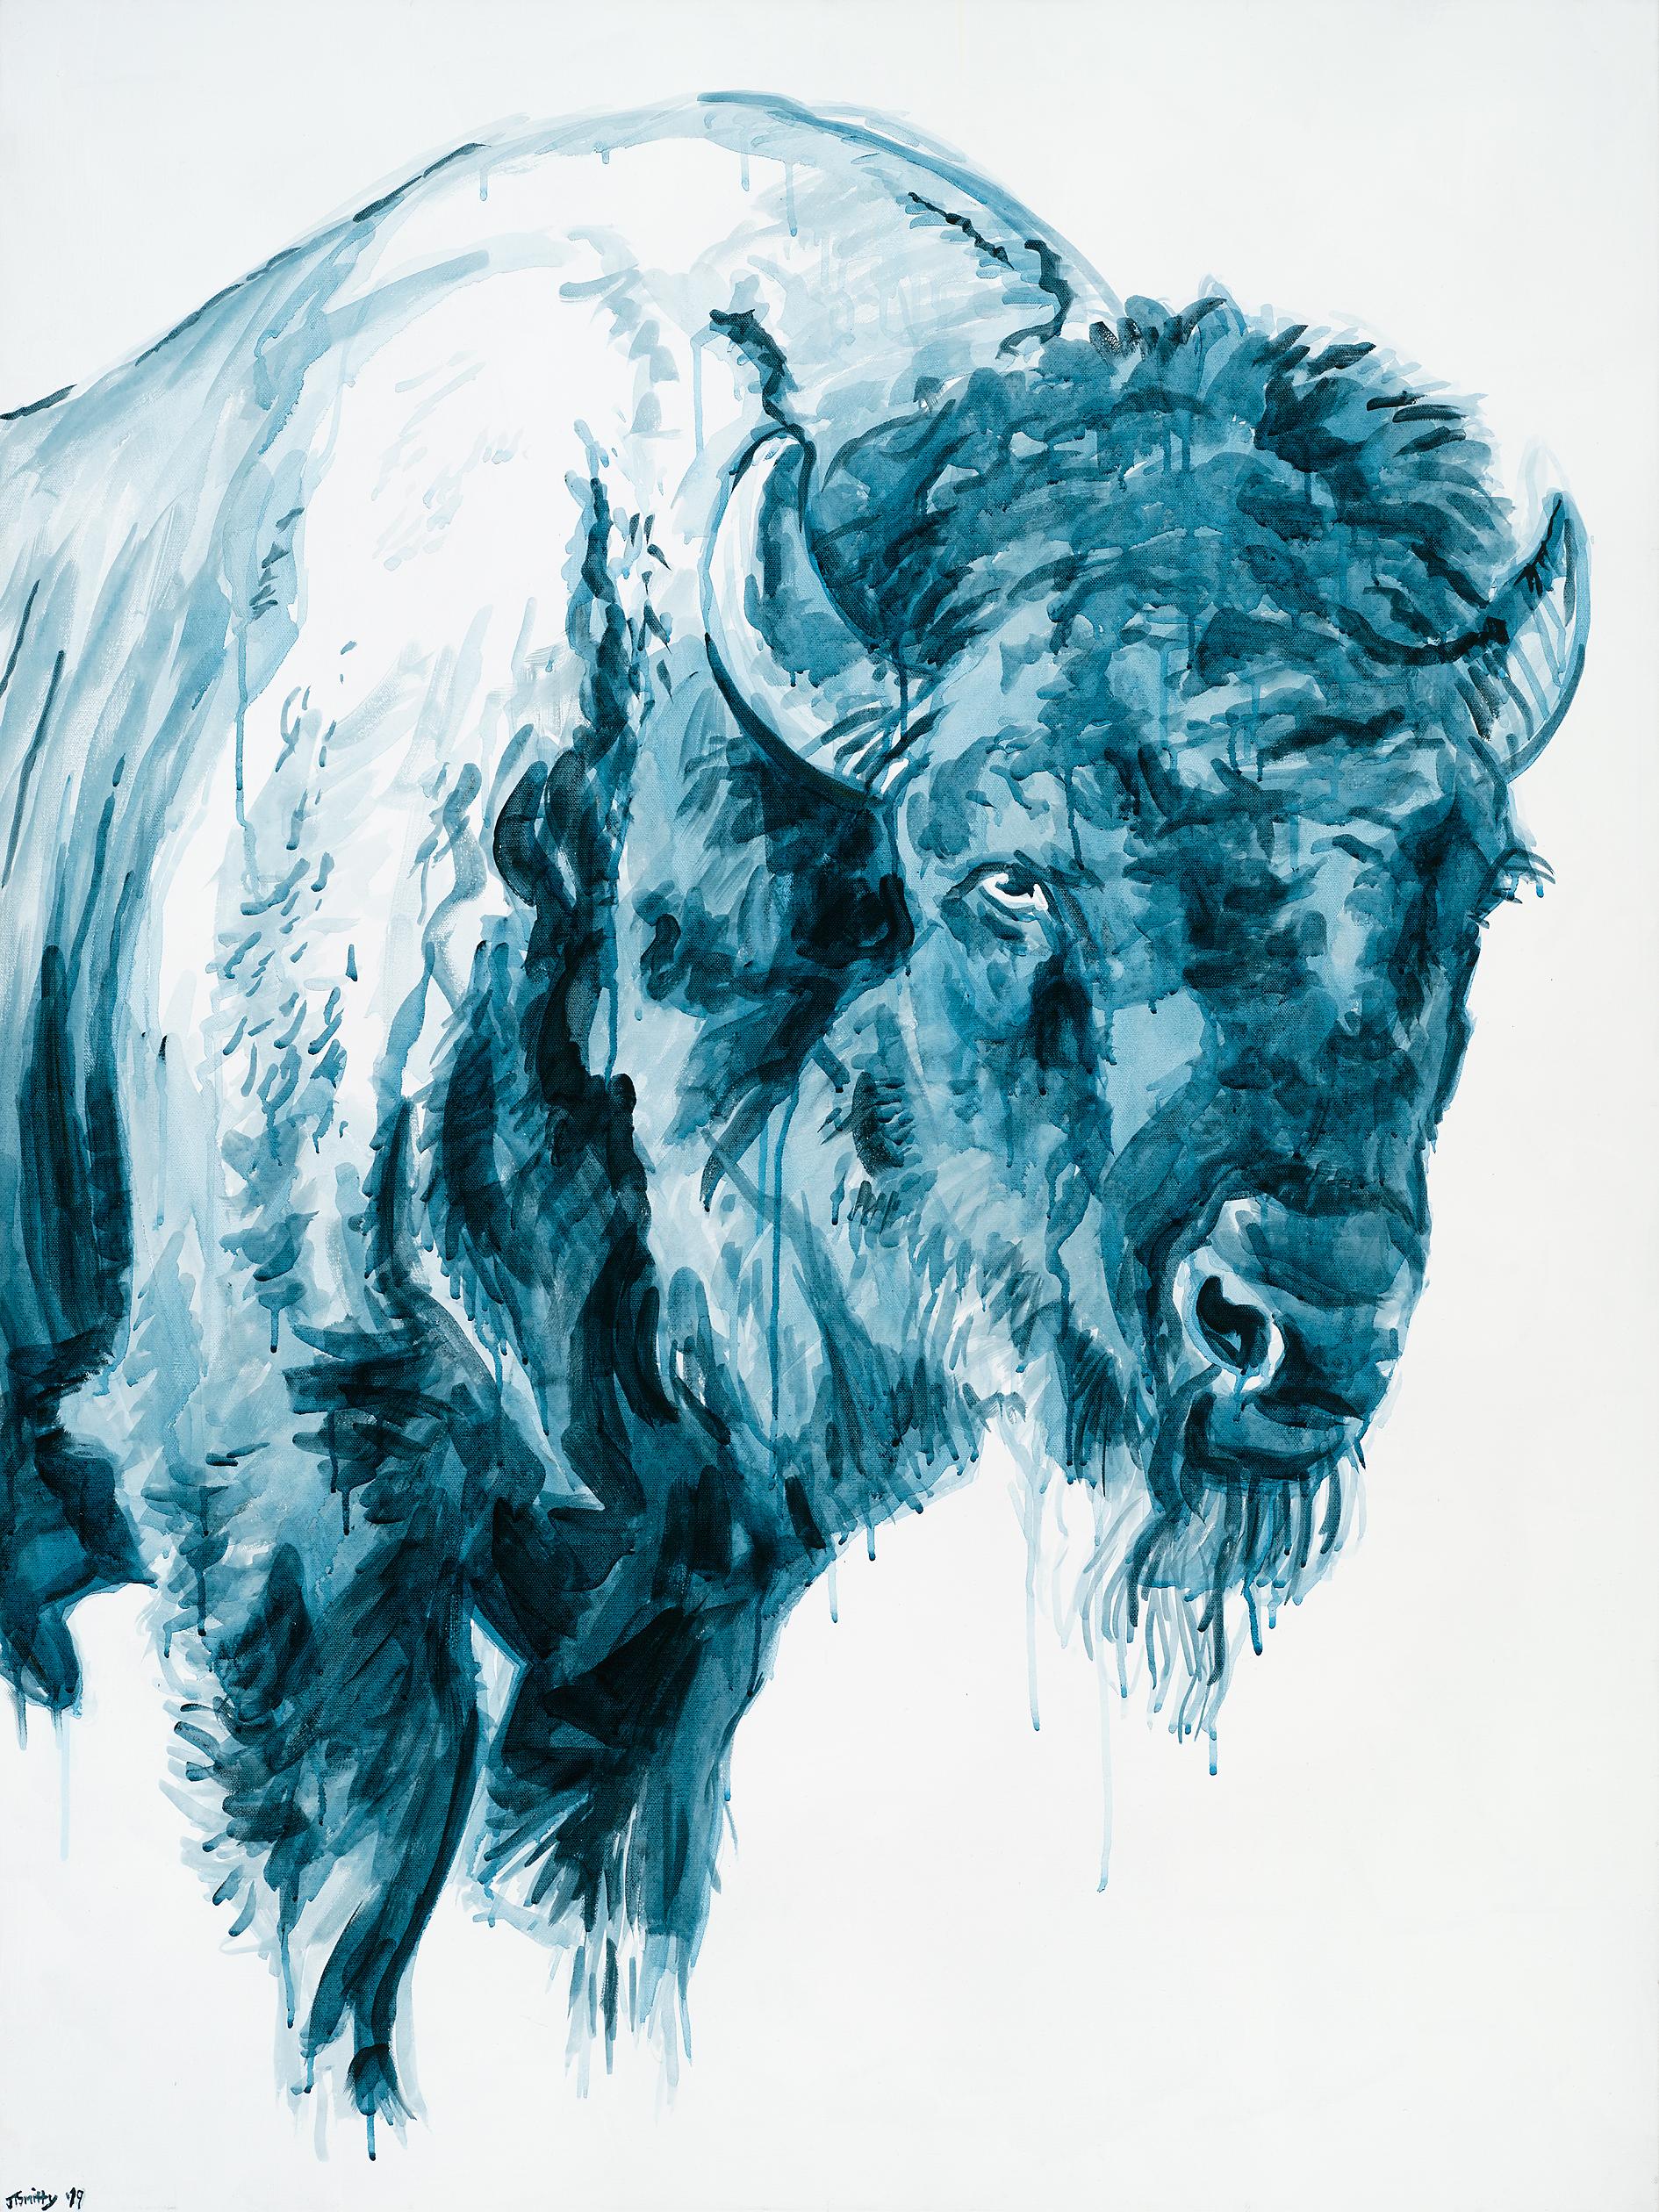 Buffalo_2520x1890.jpg